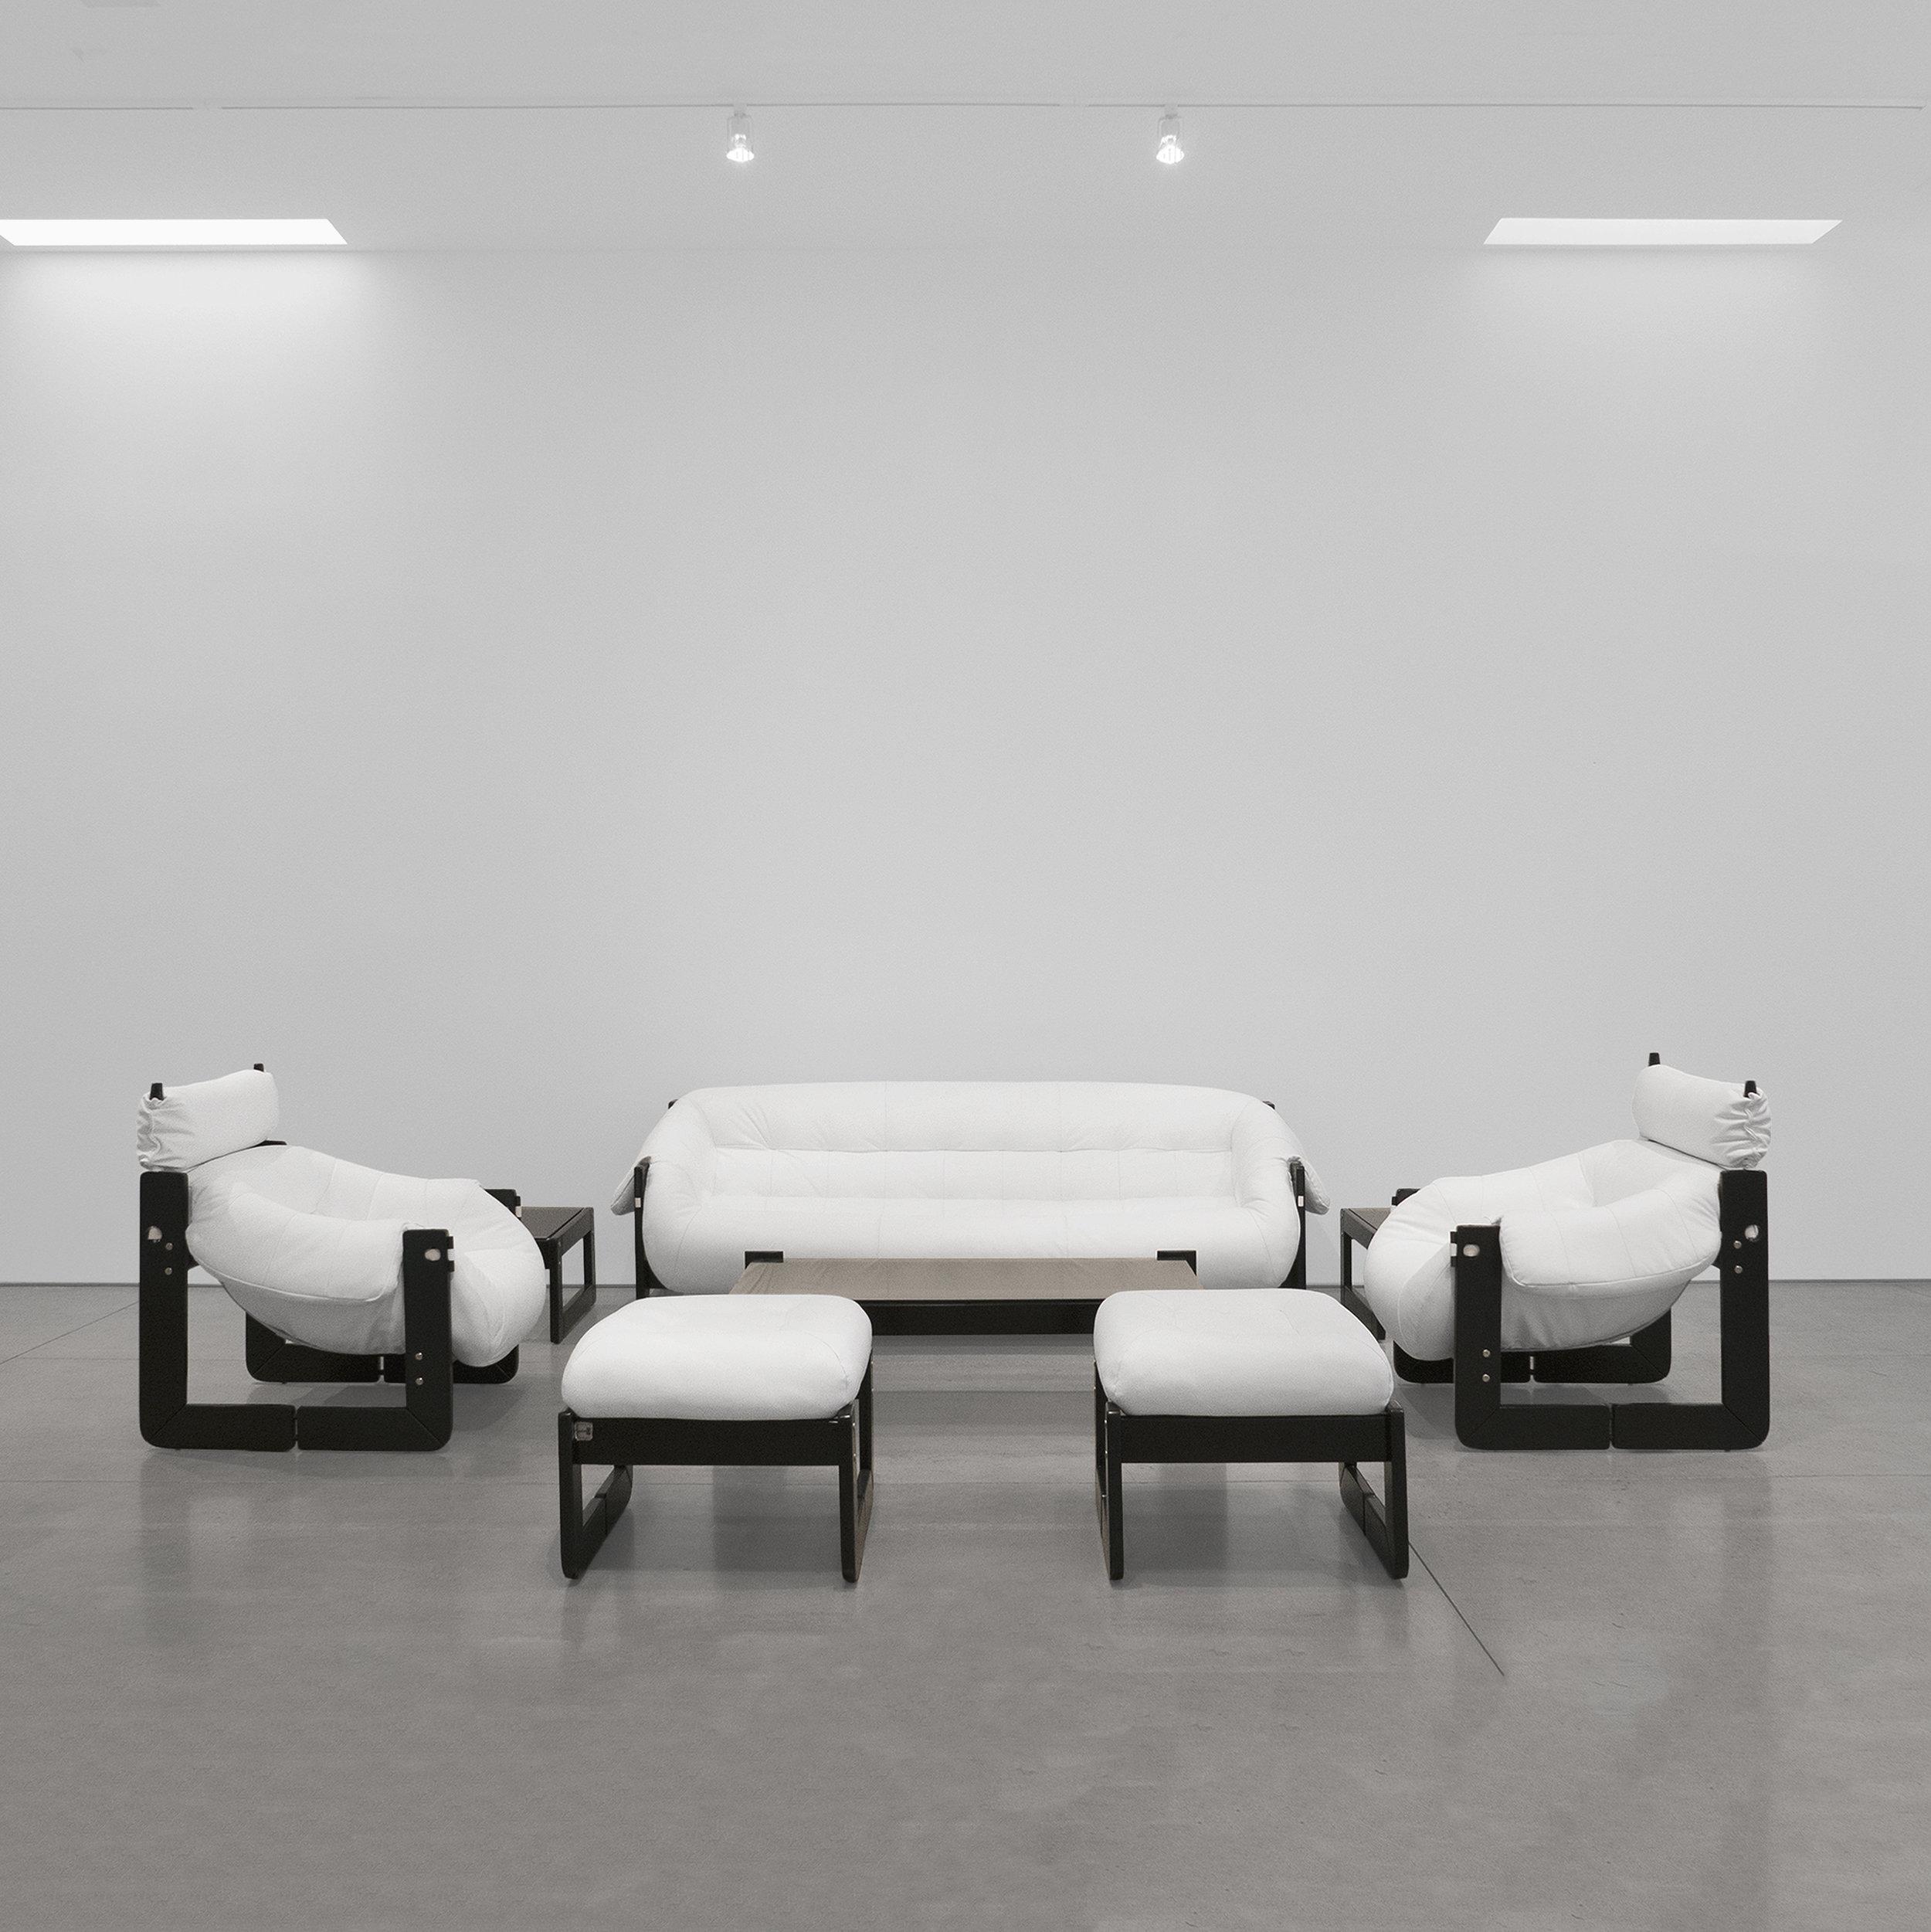 percival lafer  Club sofa set  c. 1970s ...